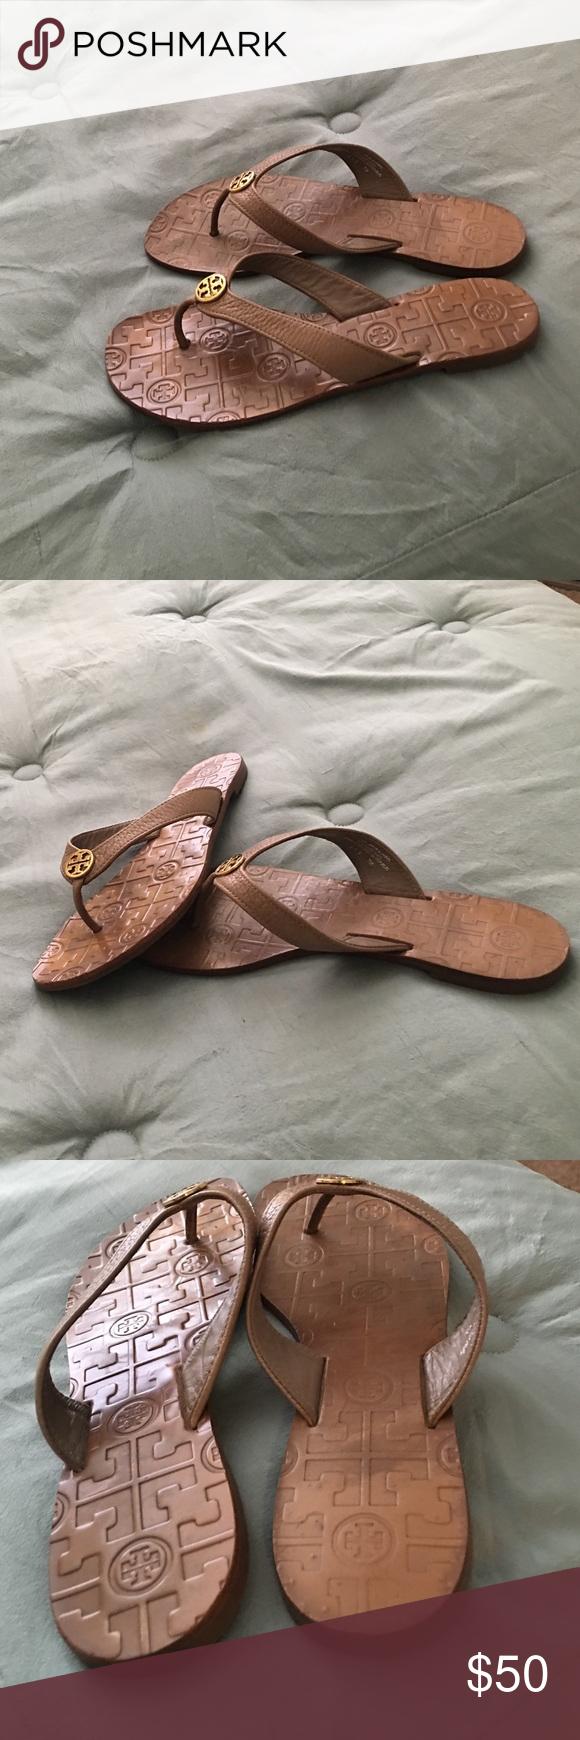 Flip flops Tory Burch Tory Burch Shoes Sandals